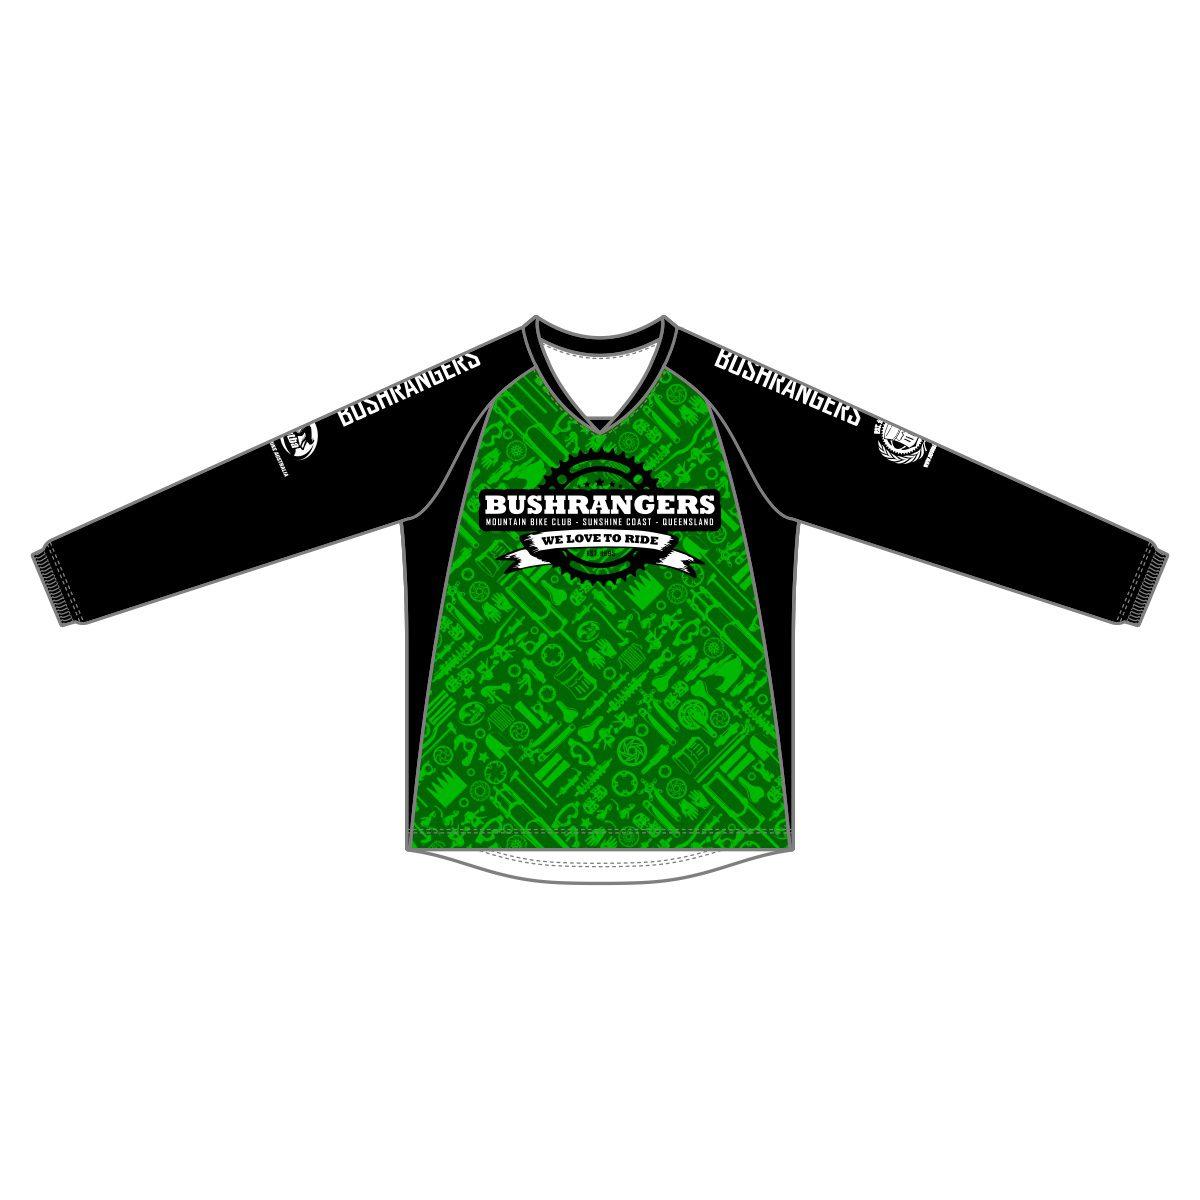 Bushrangers MTB Mens Long Sleeve - Enduro.DH Jersey Green Black - VL67946 -  Front ef921fac0